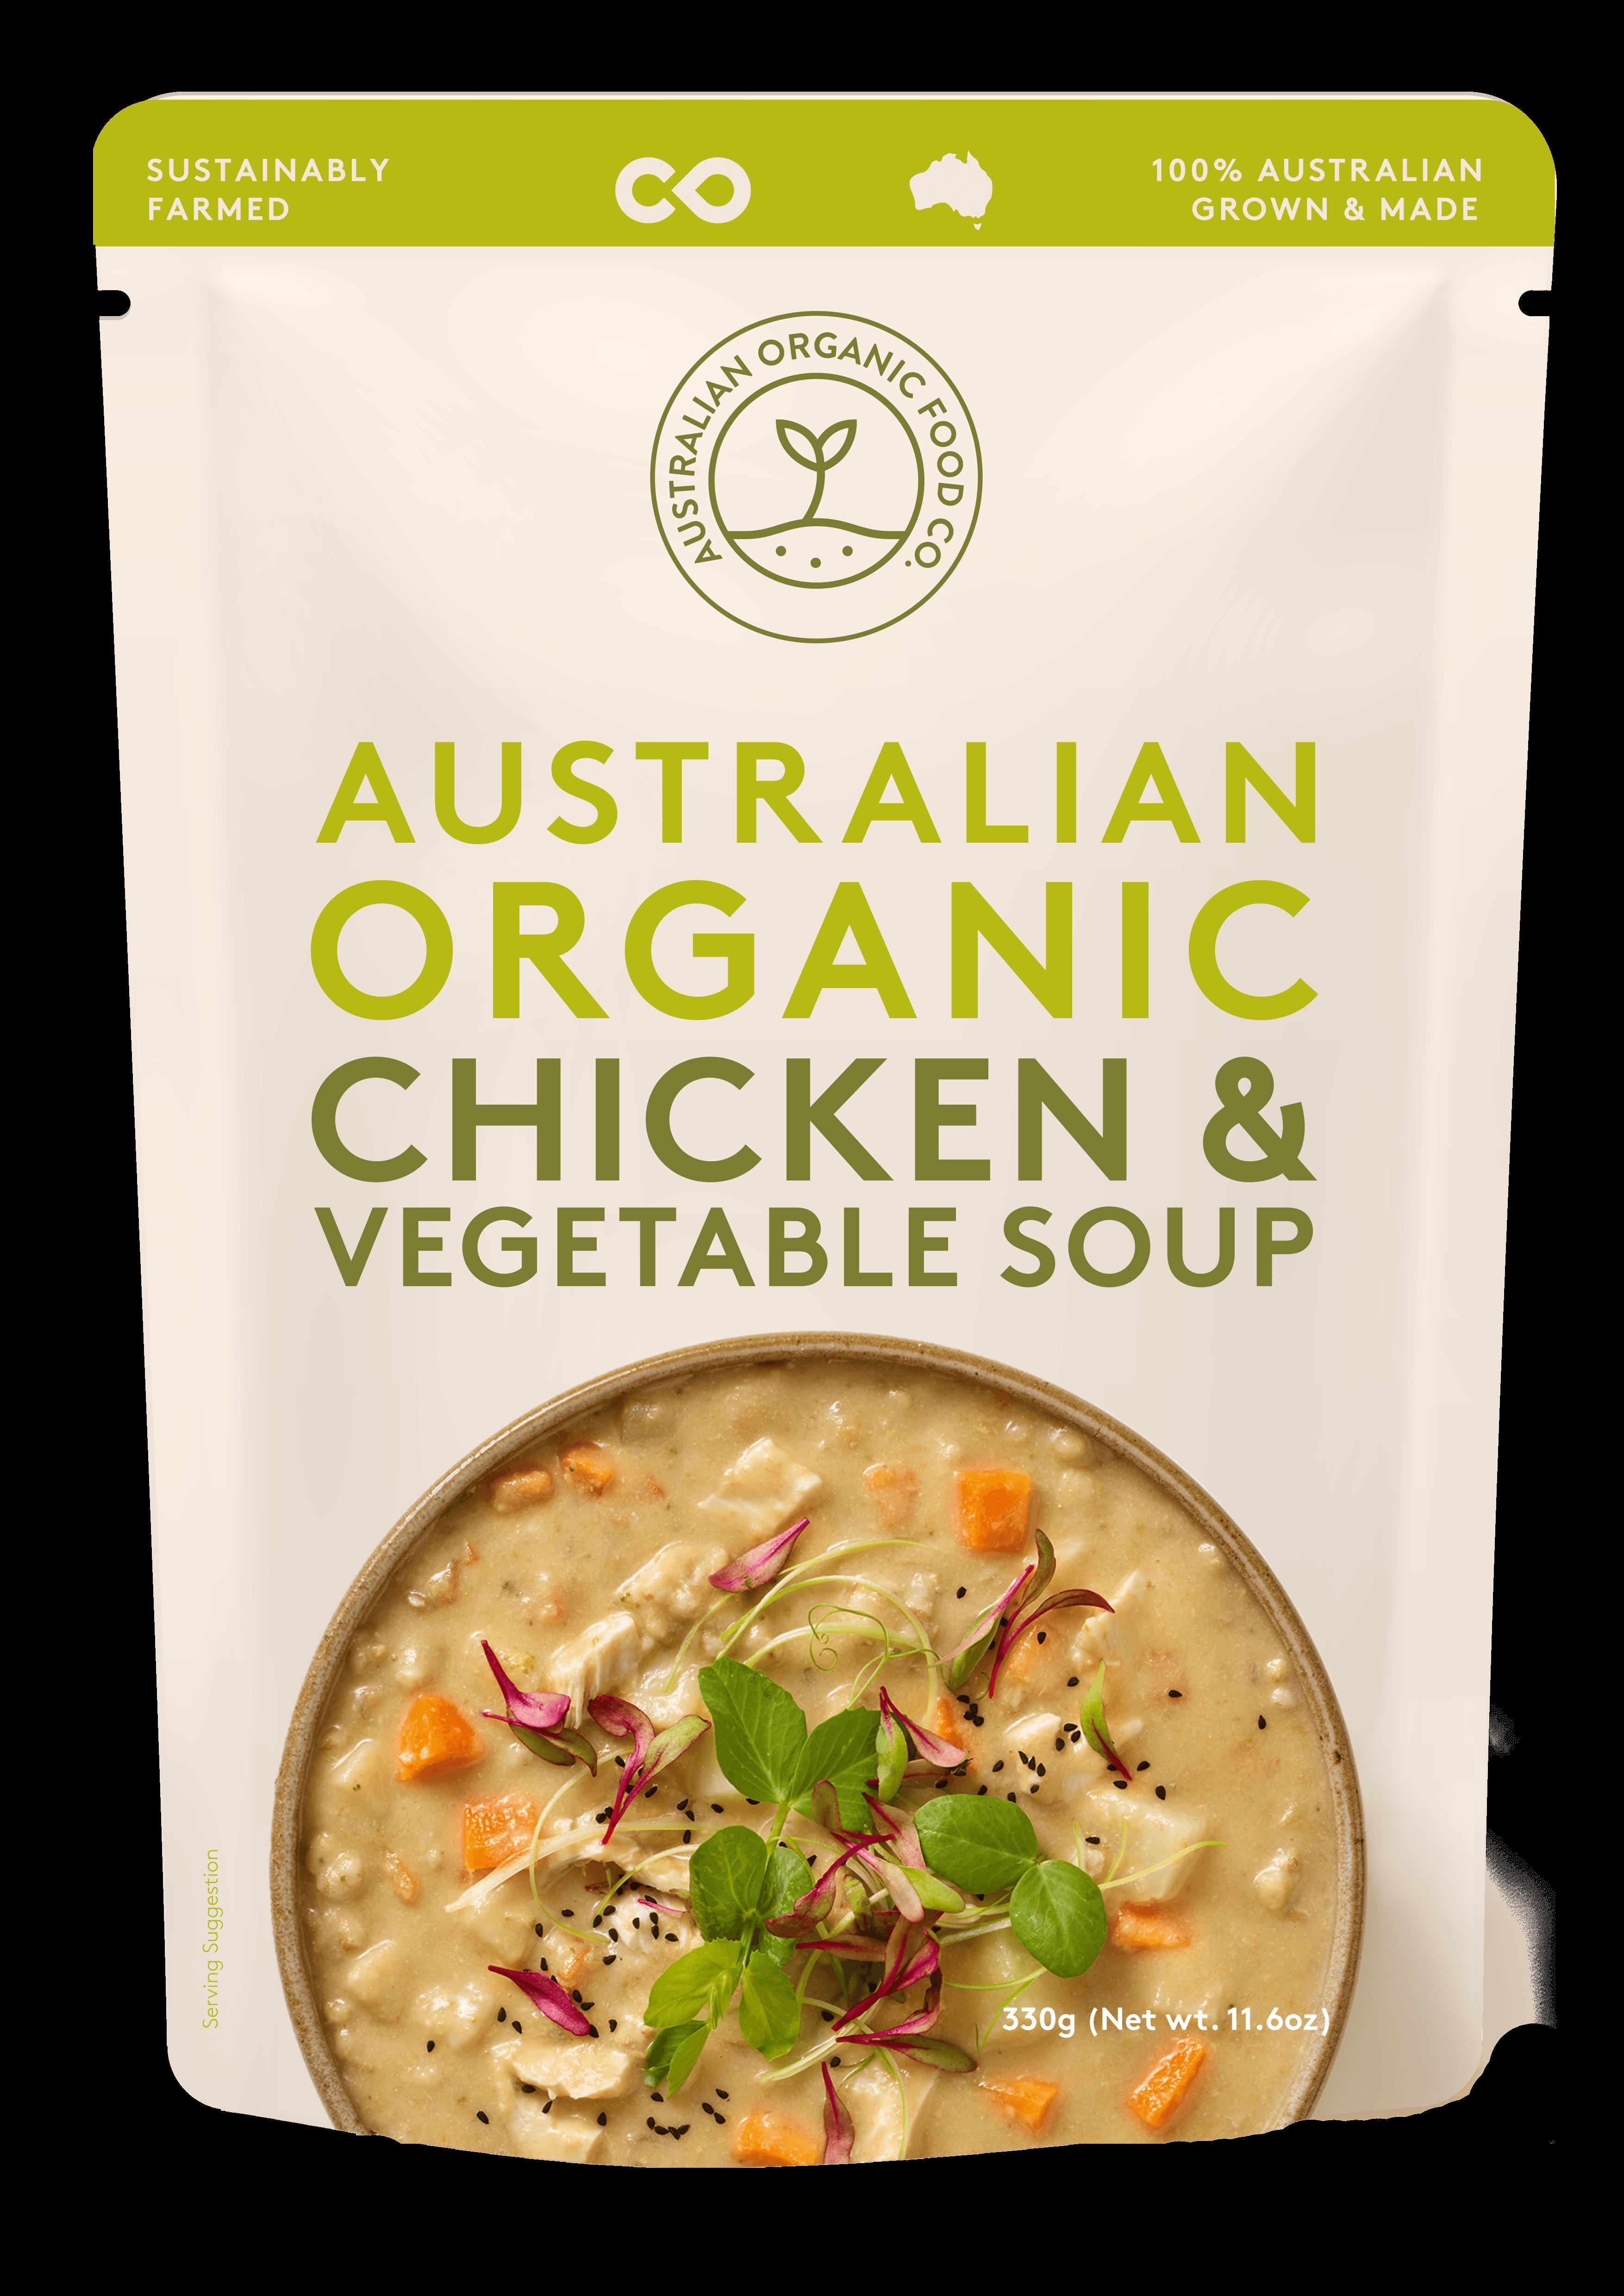 Chicken, Spelt & Vegetable Soup